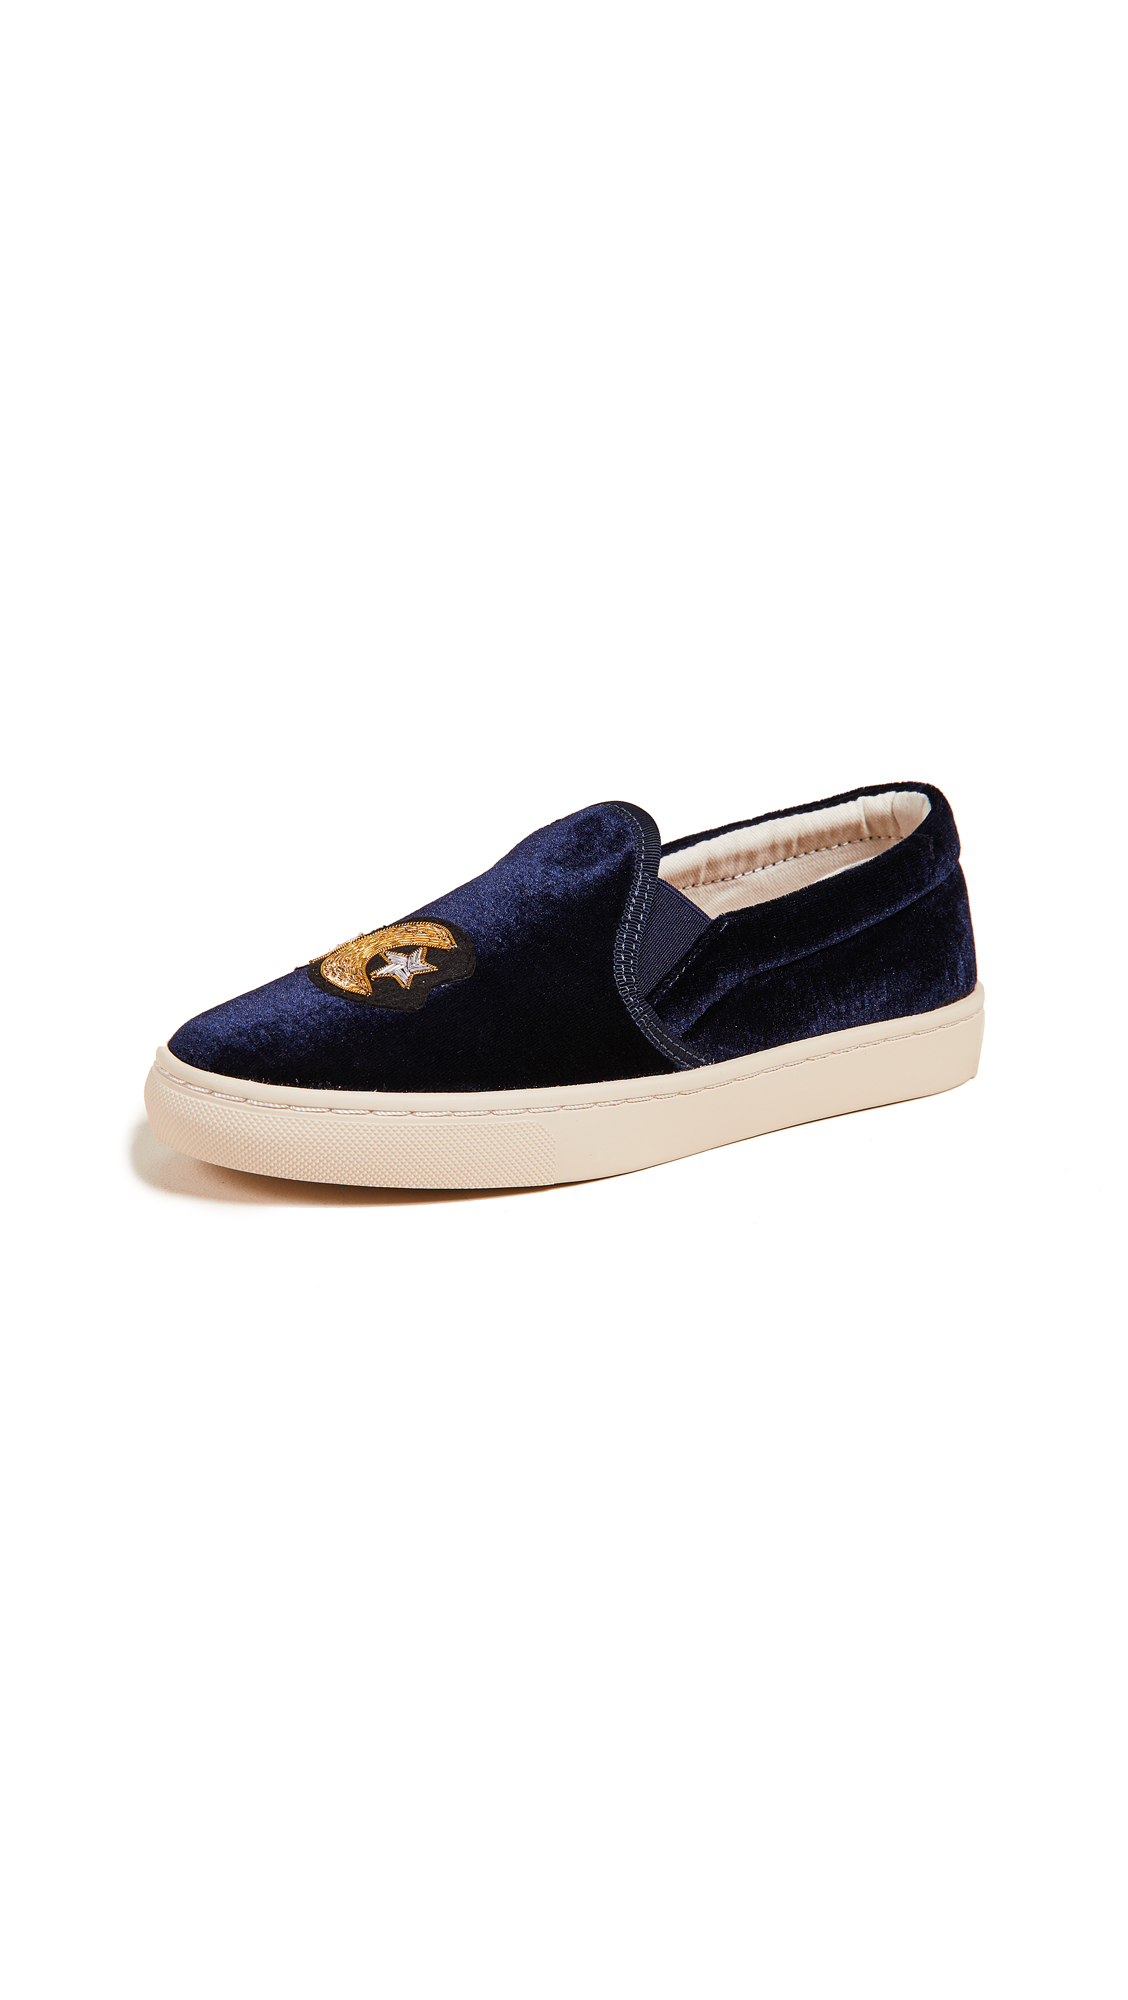 Soludos Celestial Slip On Sneakers - Navy